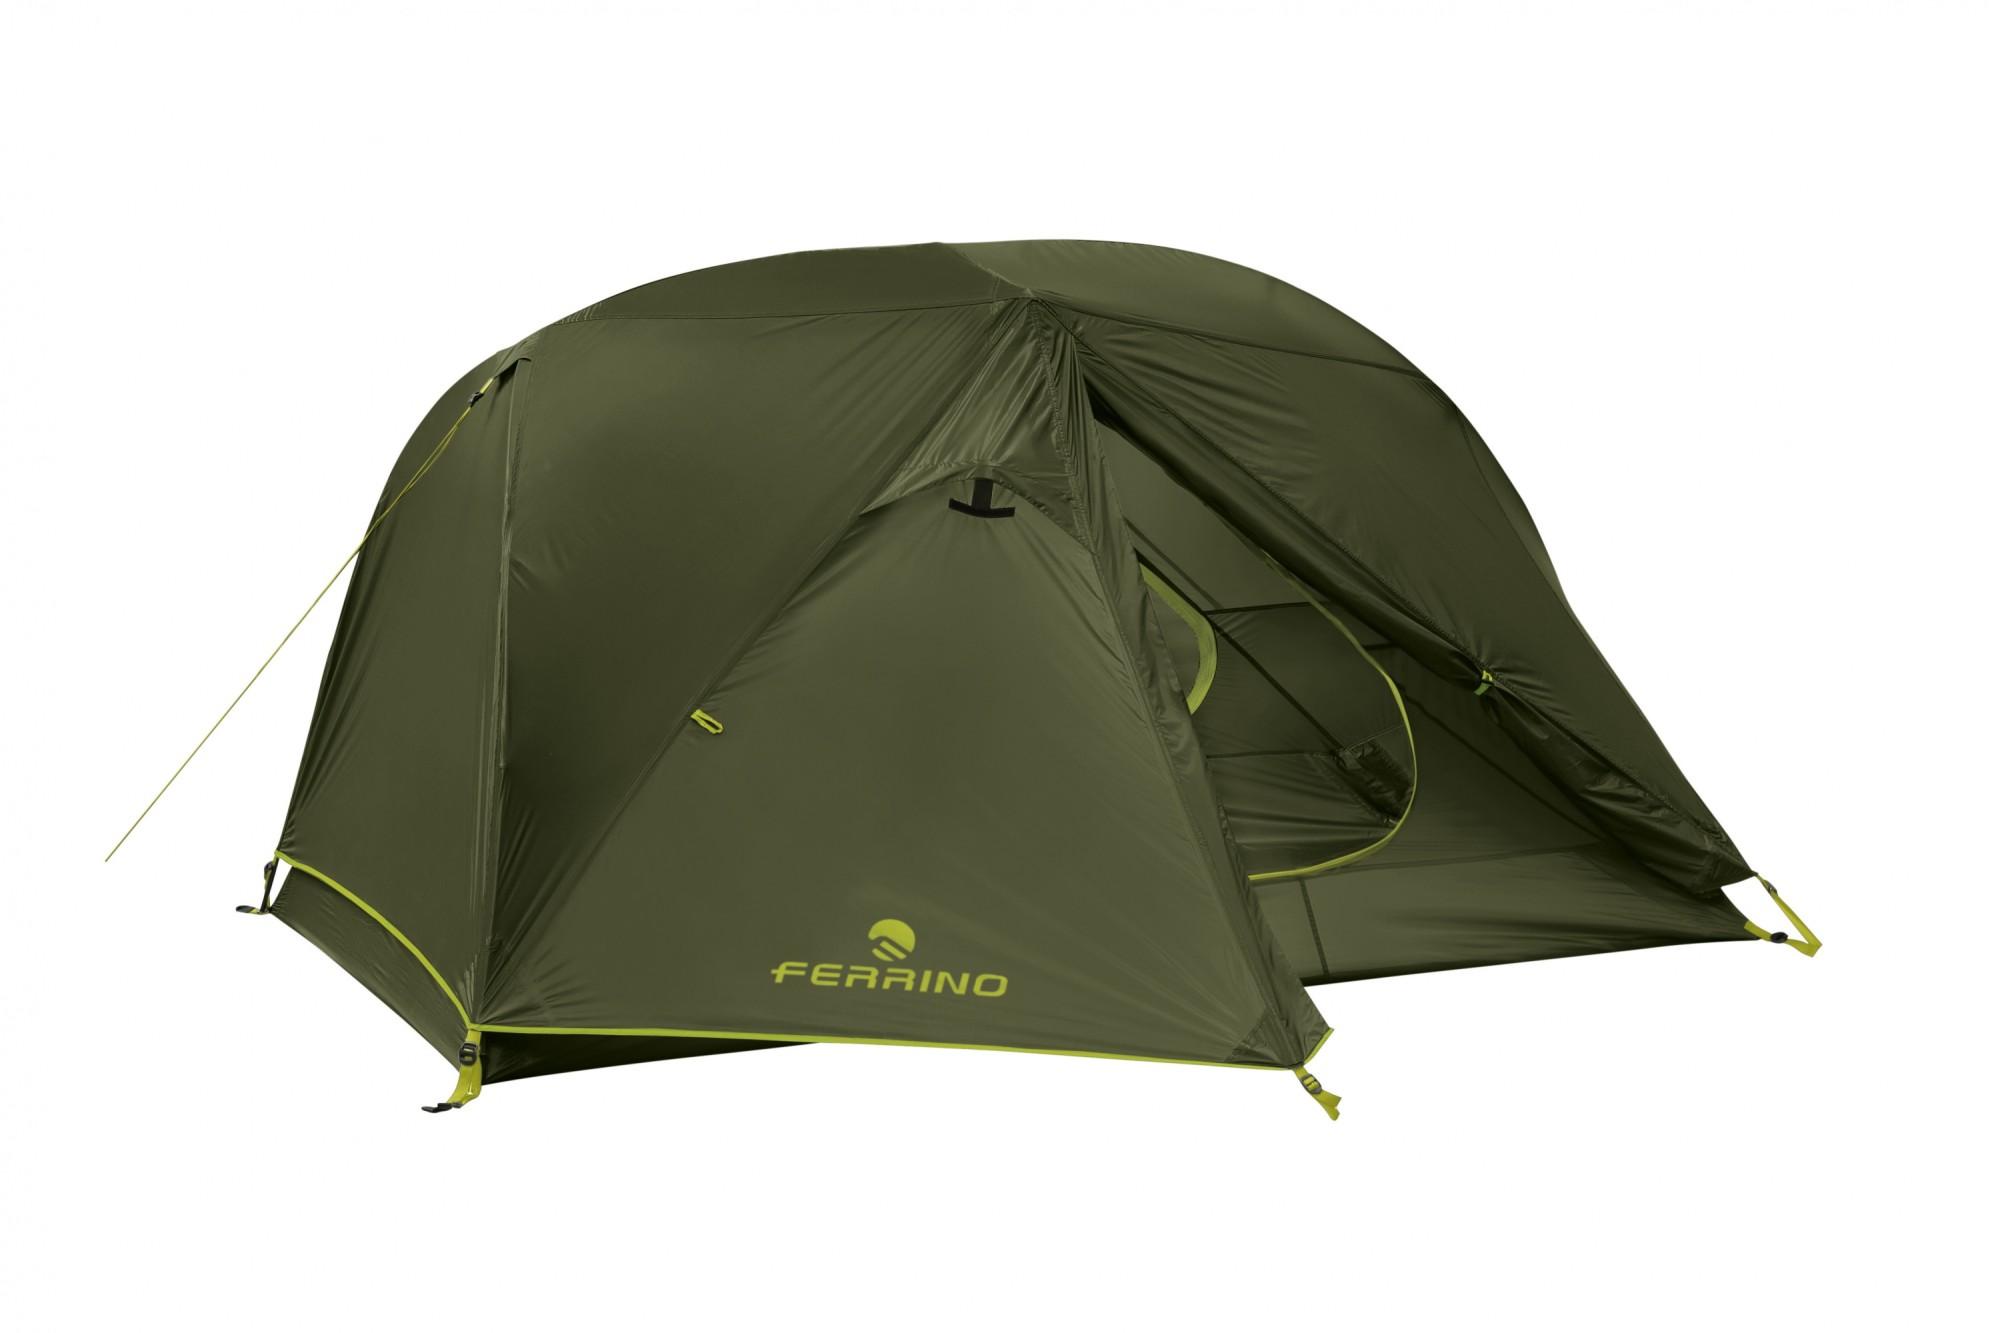 Ferrino Atrax 2 - Tente